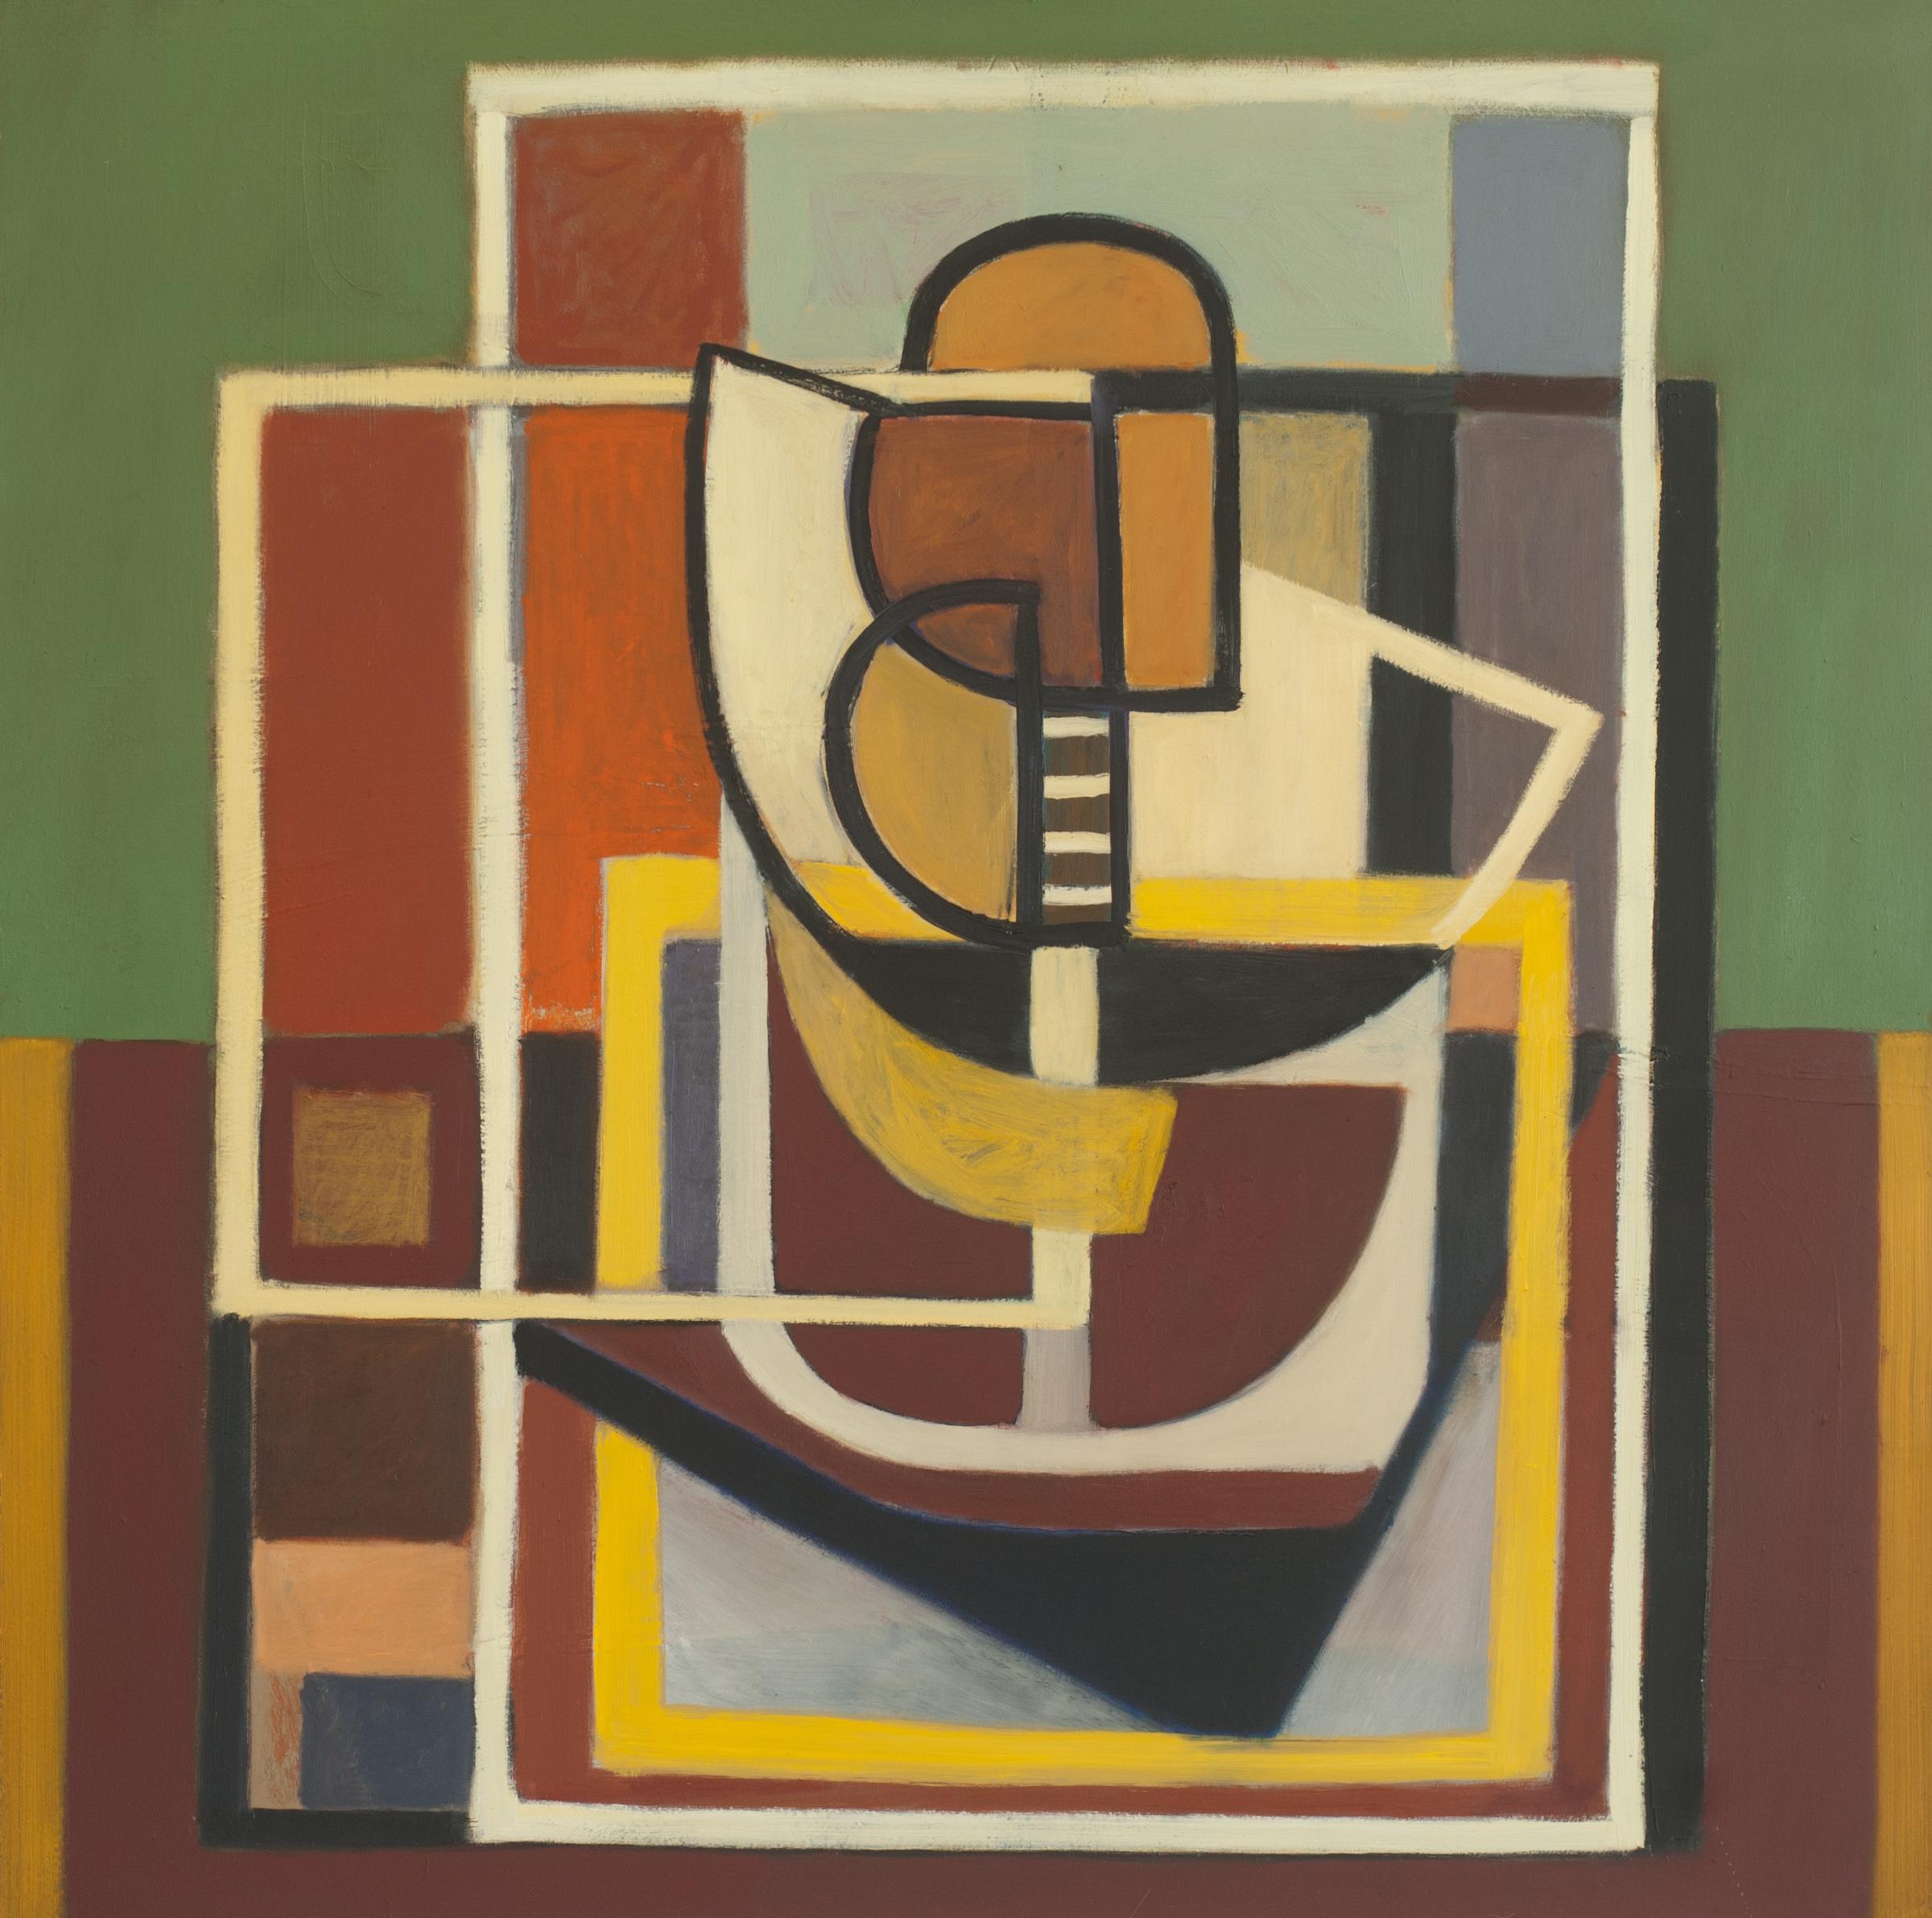 Square Rectangle Square - Sold